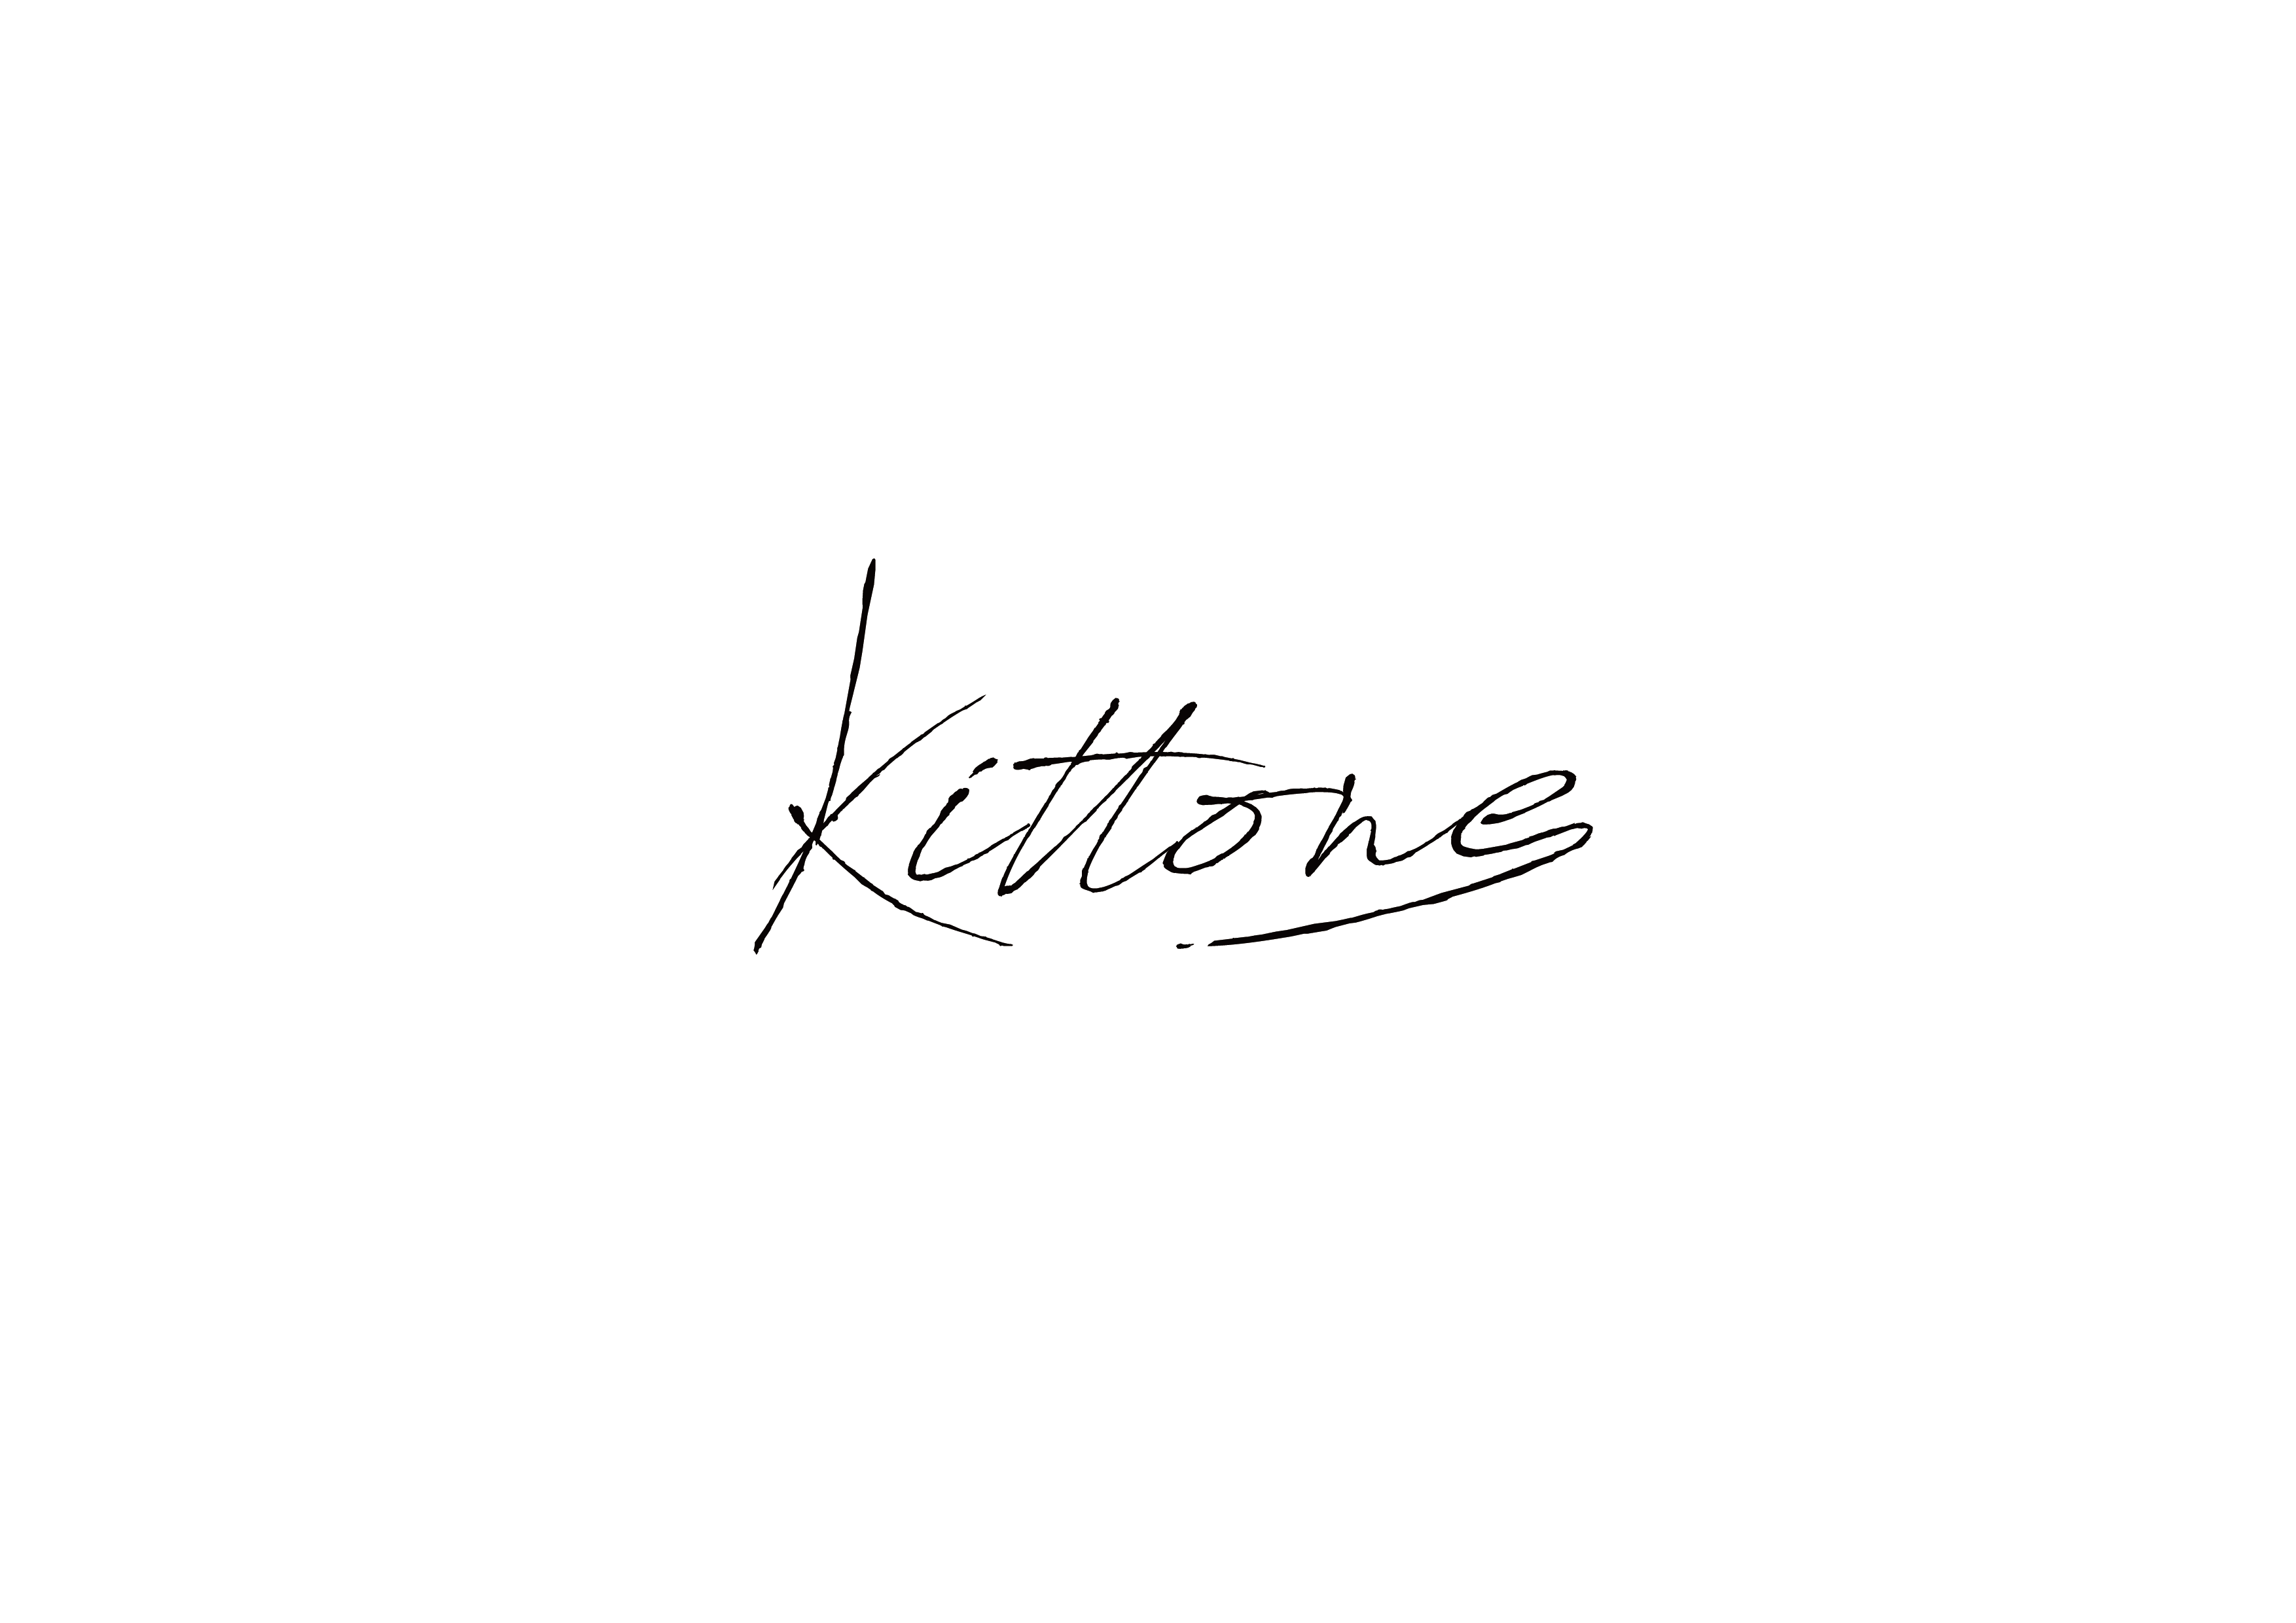 kittone